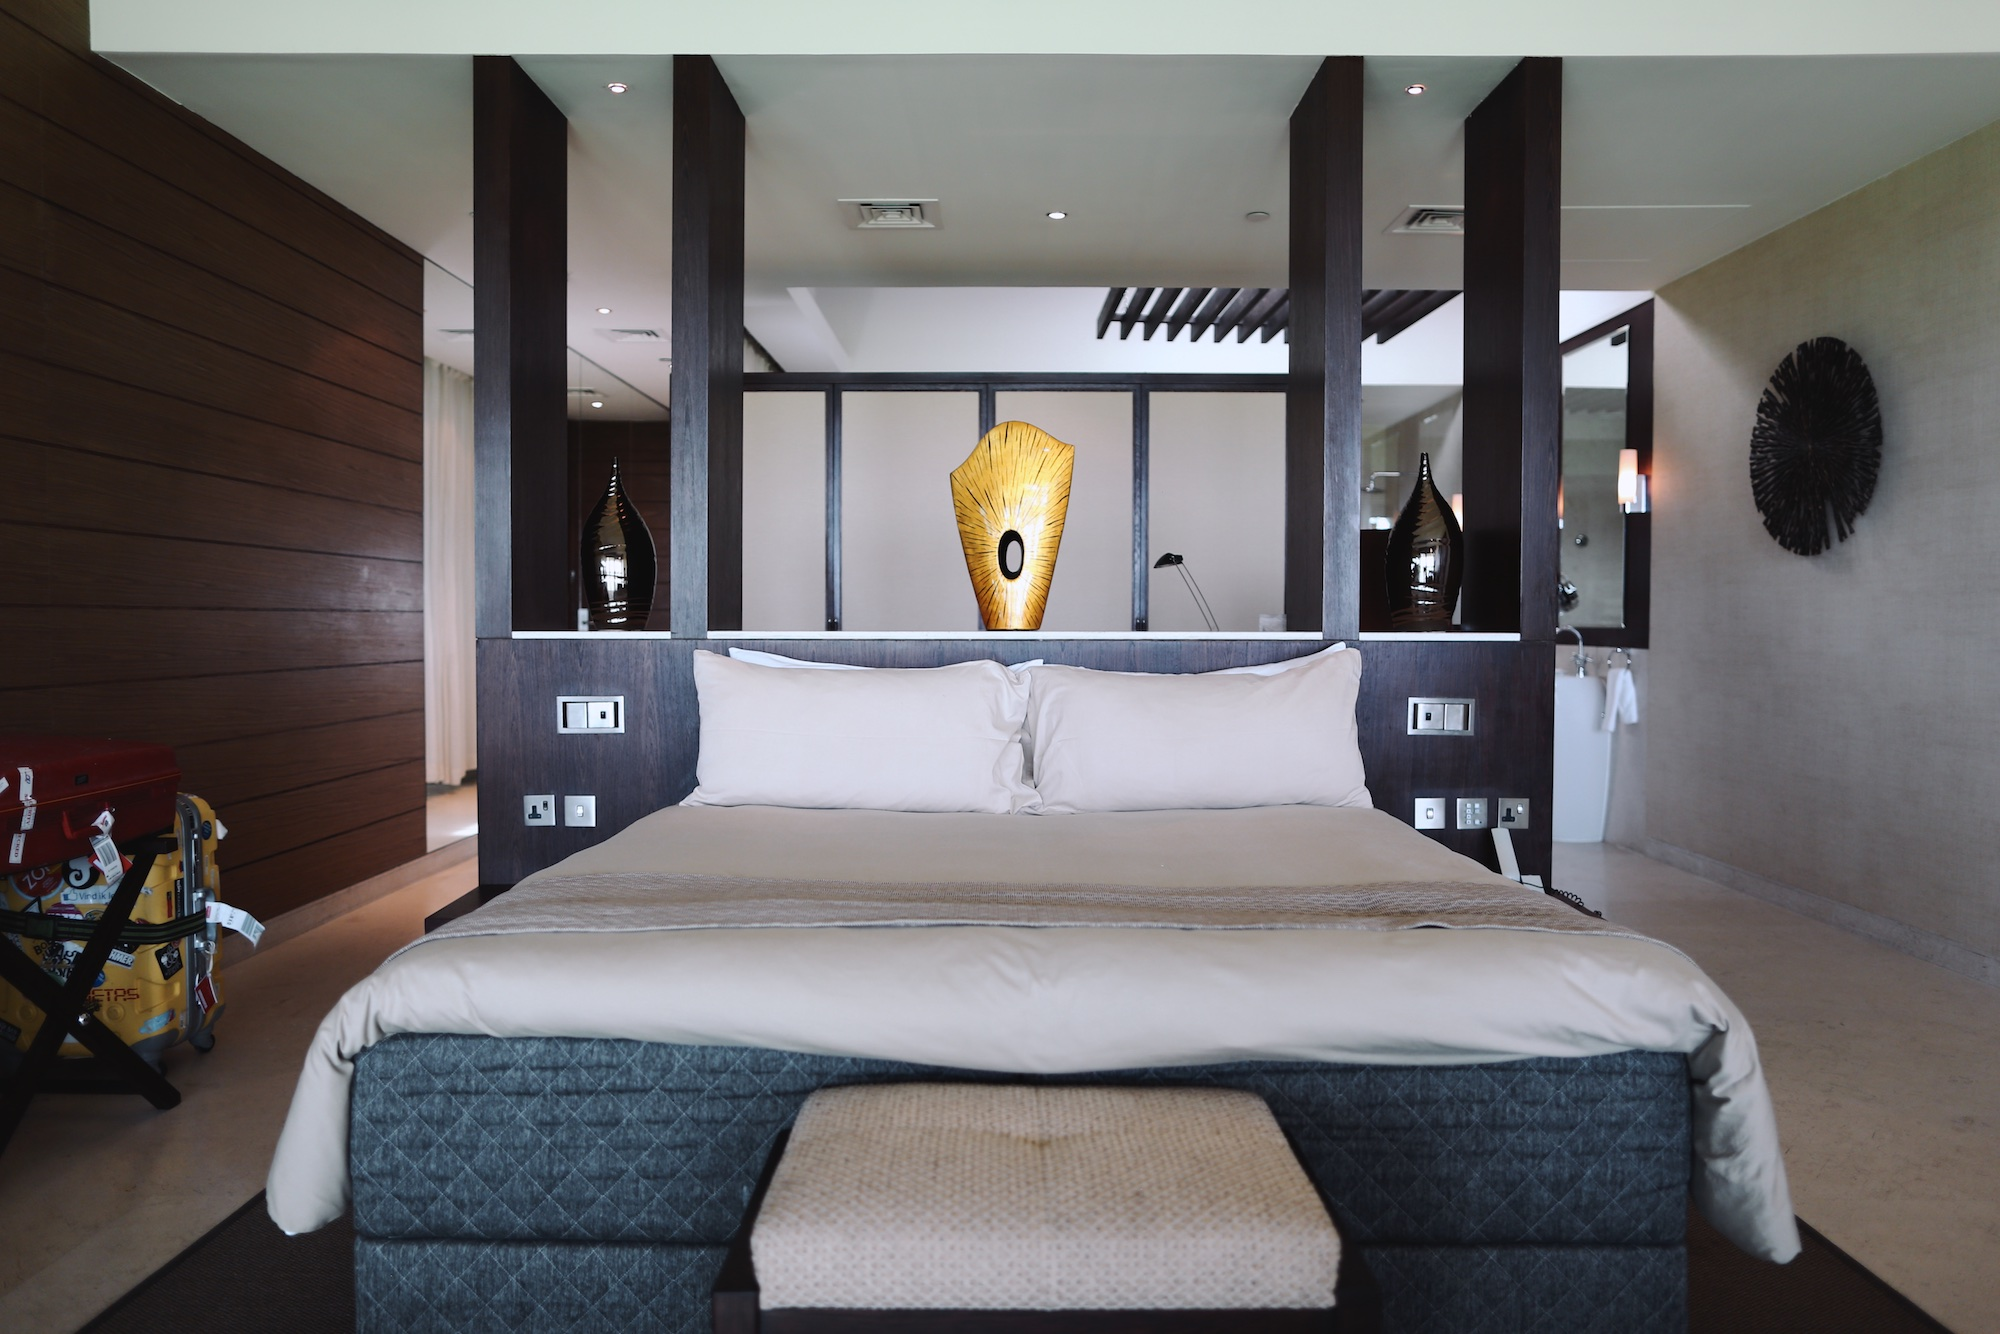 desert palm dubai, luxury stay dubai, travel dubai, hotspot dubai